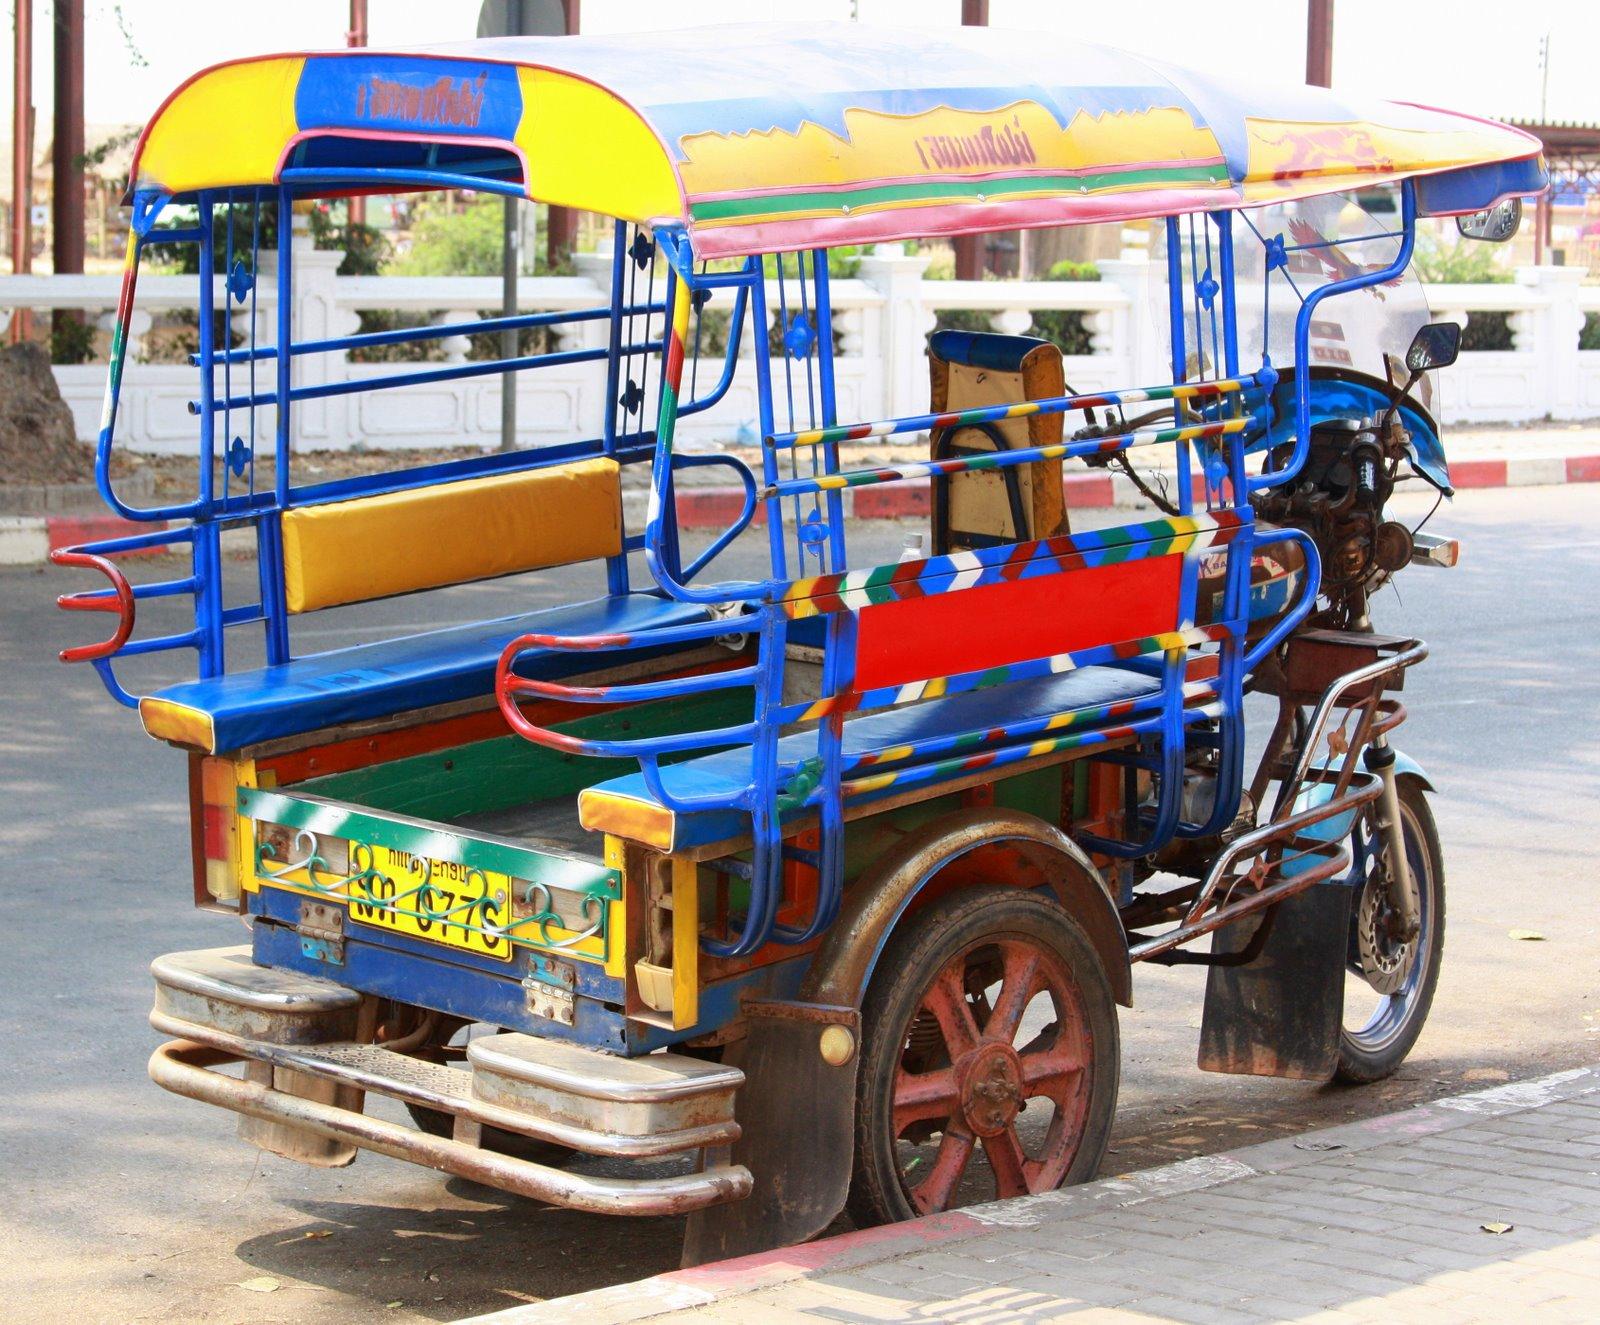 A Tuk tuk in Vientiane